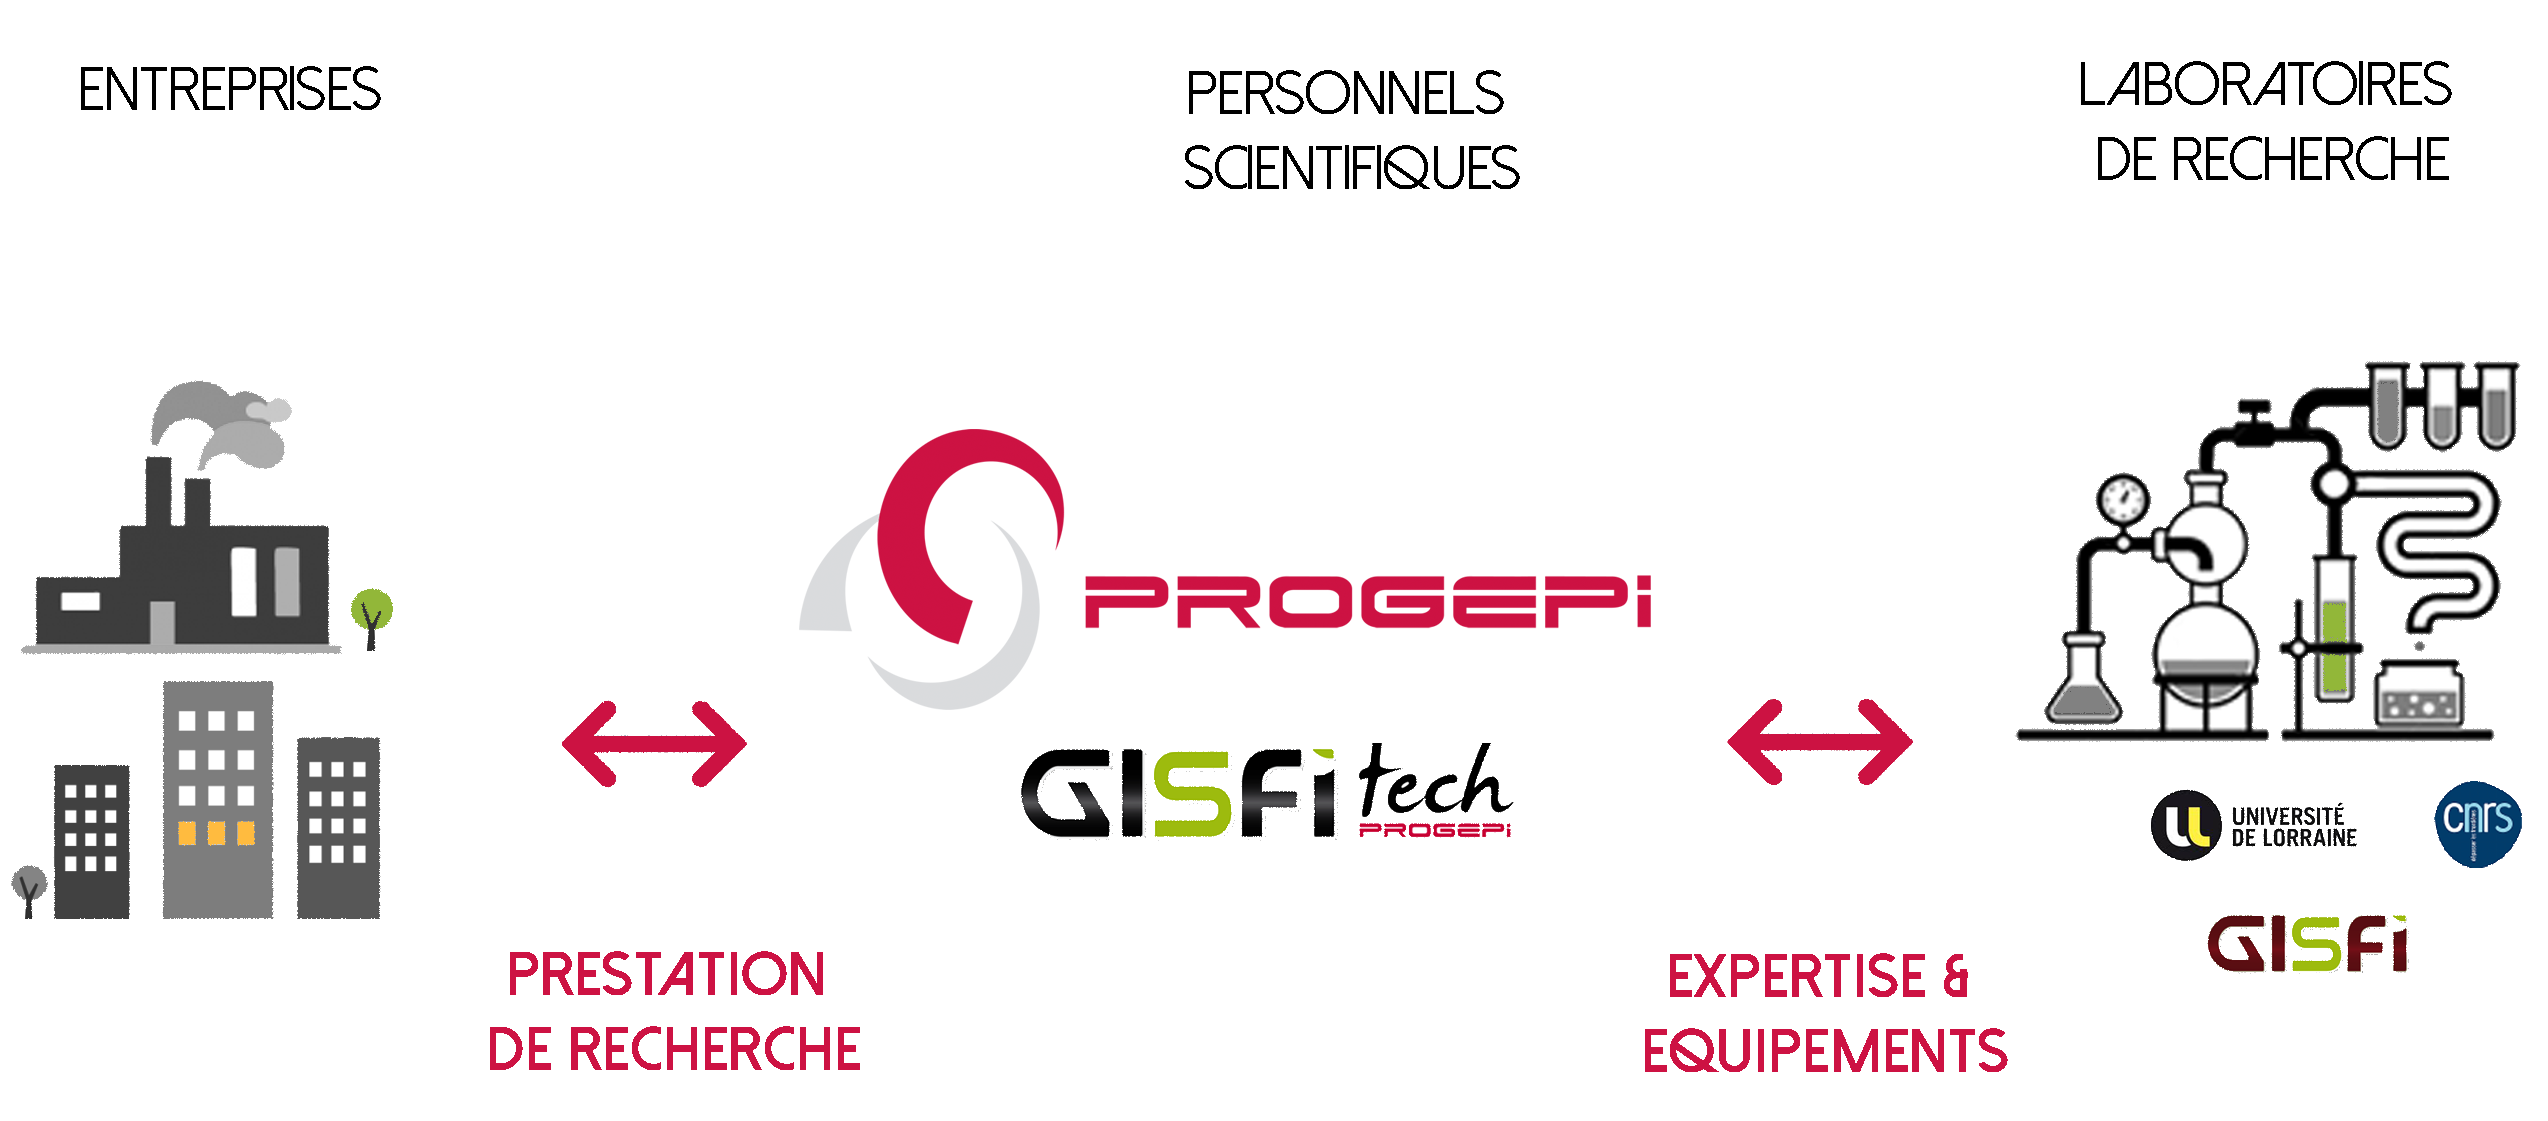 GIFITech interface entreprise/laboratoires